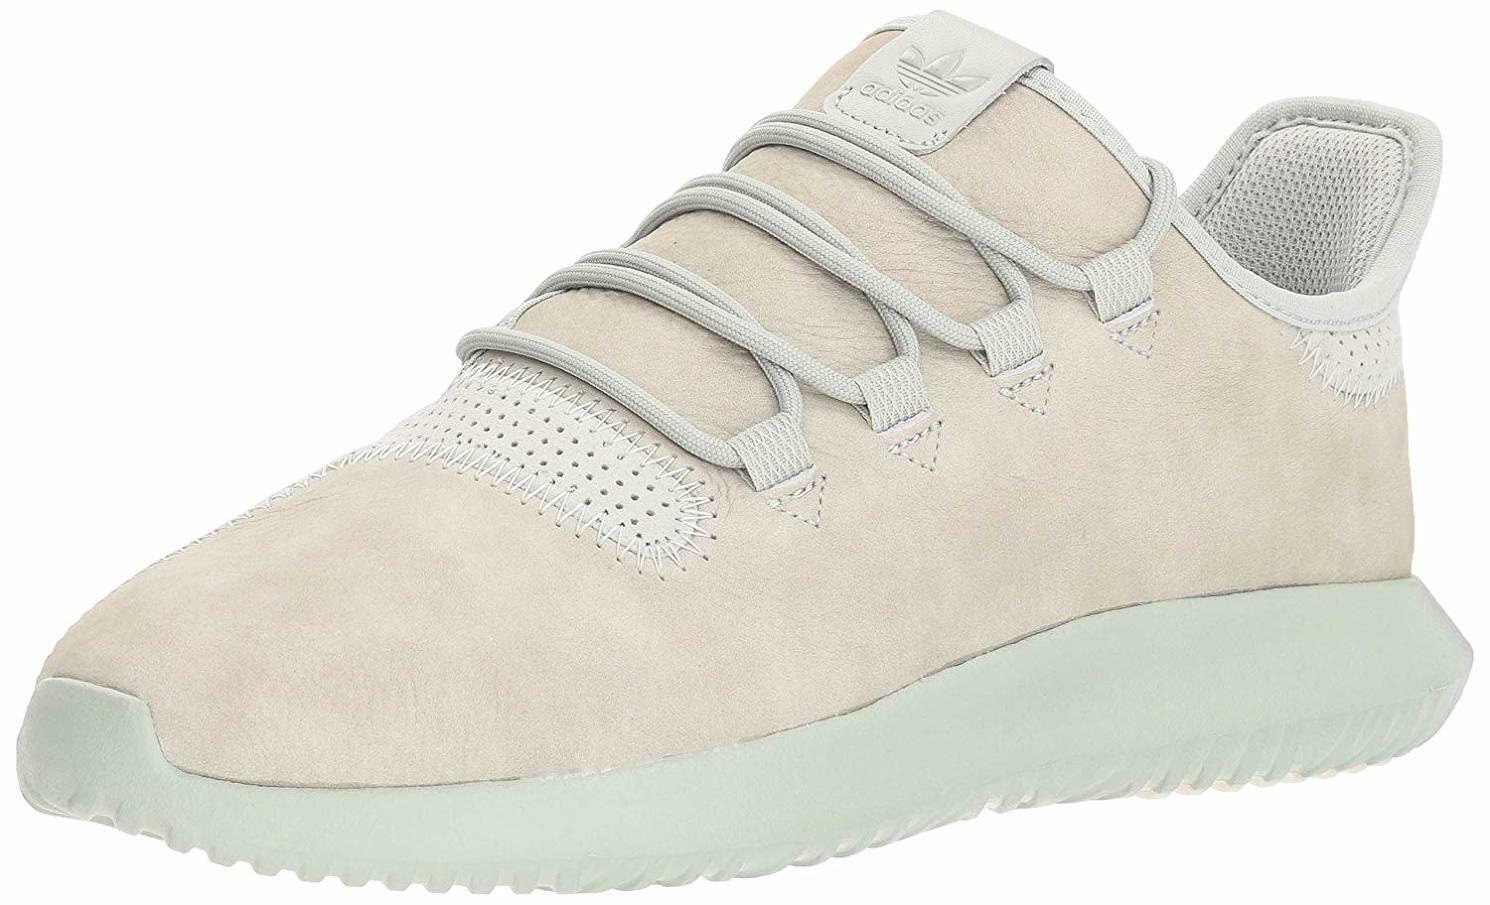 Adidas Originals Men's Tubular Shadow Running shoes